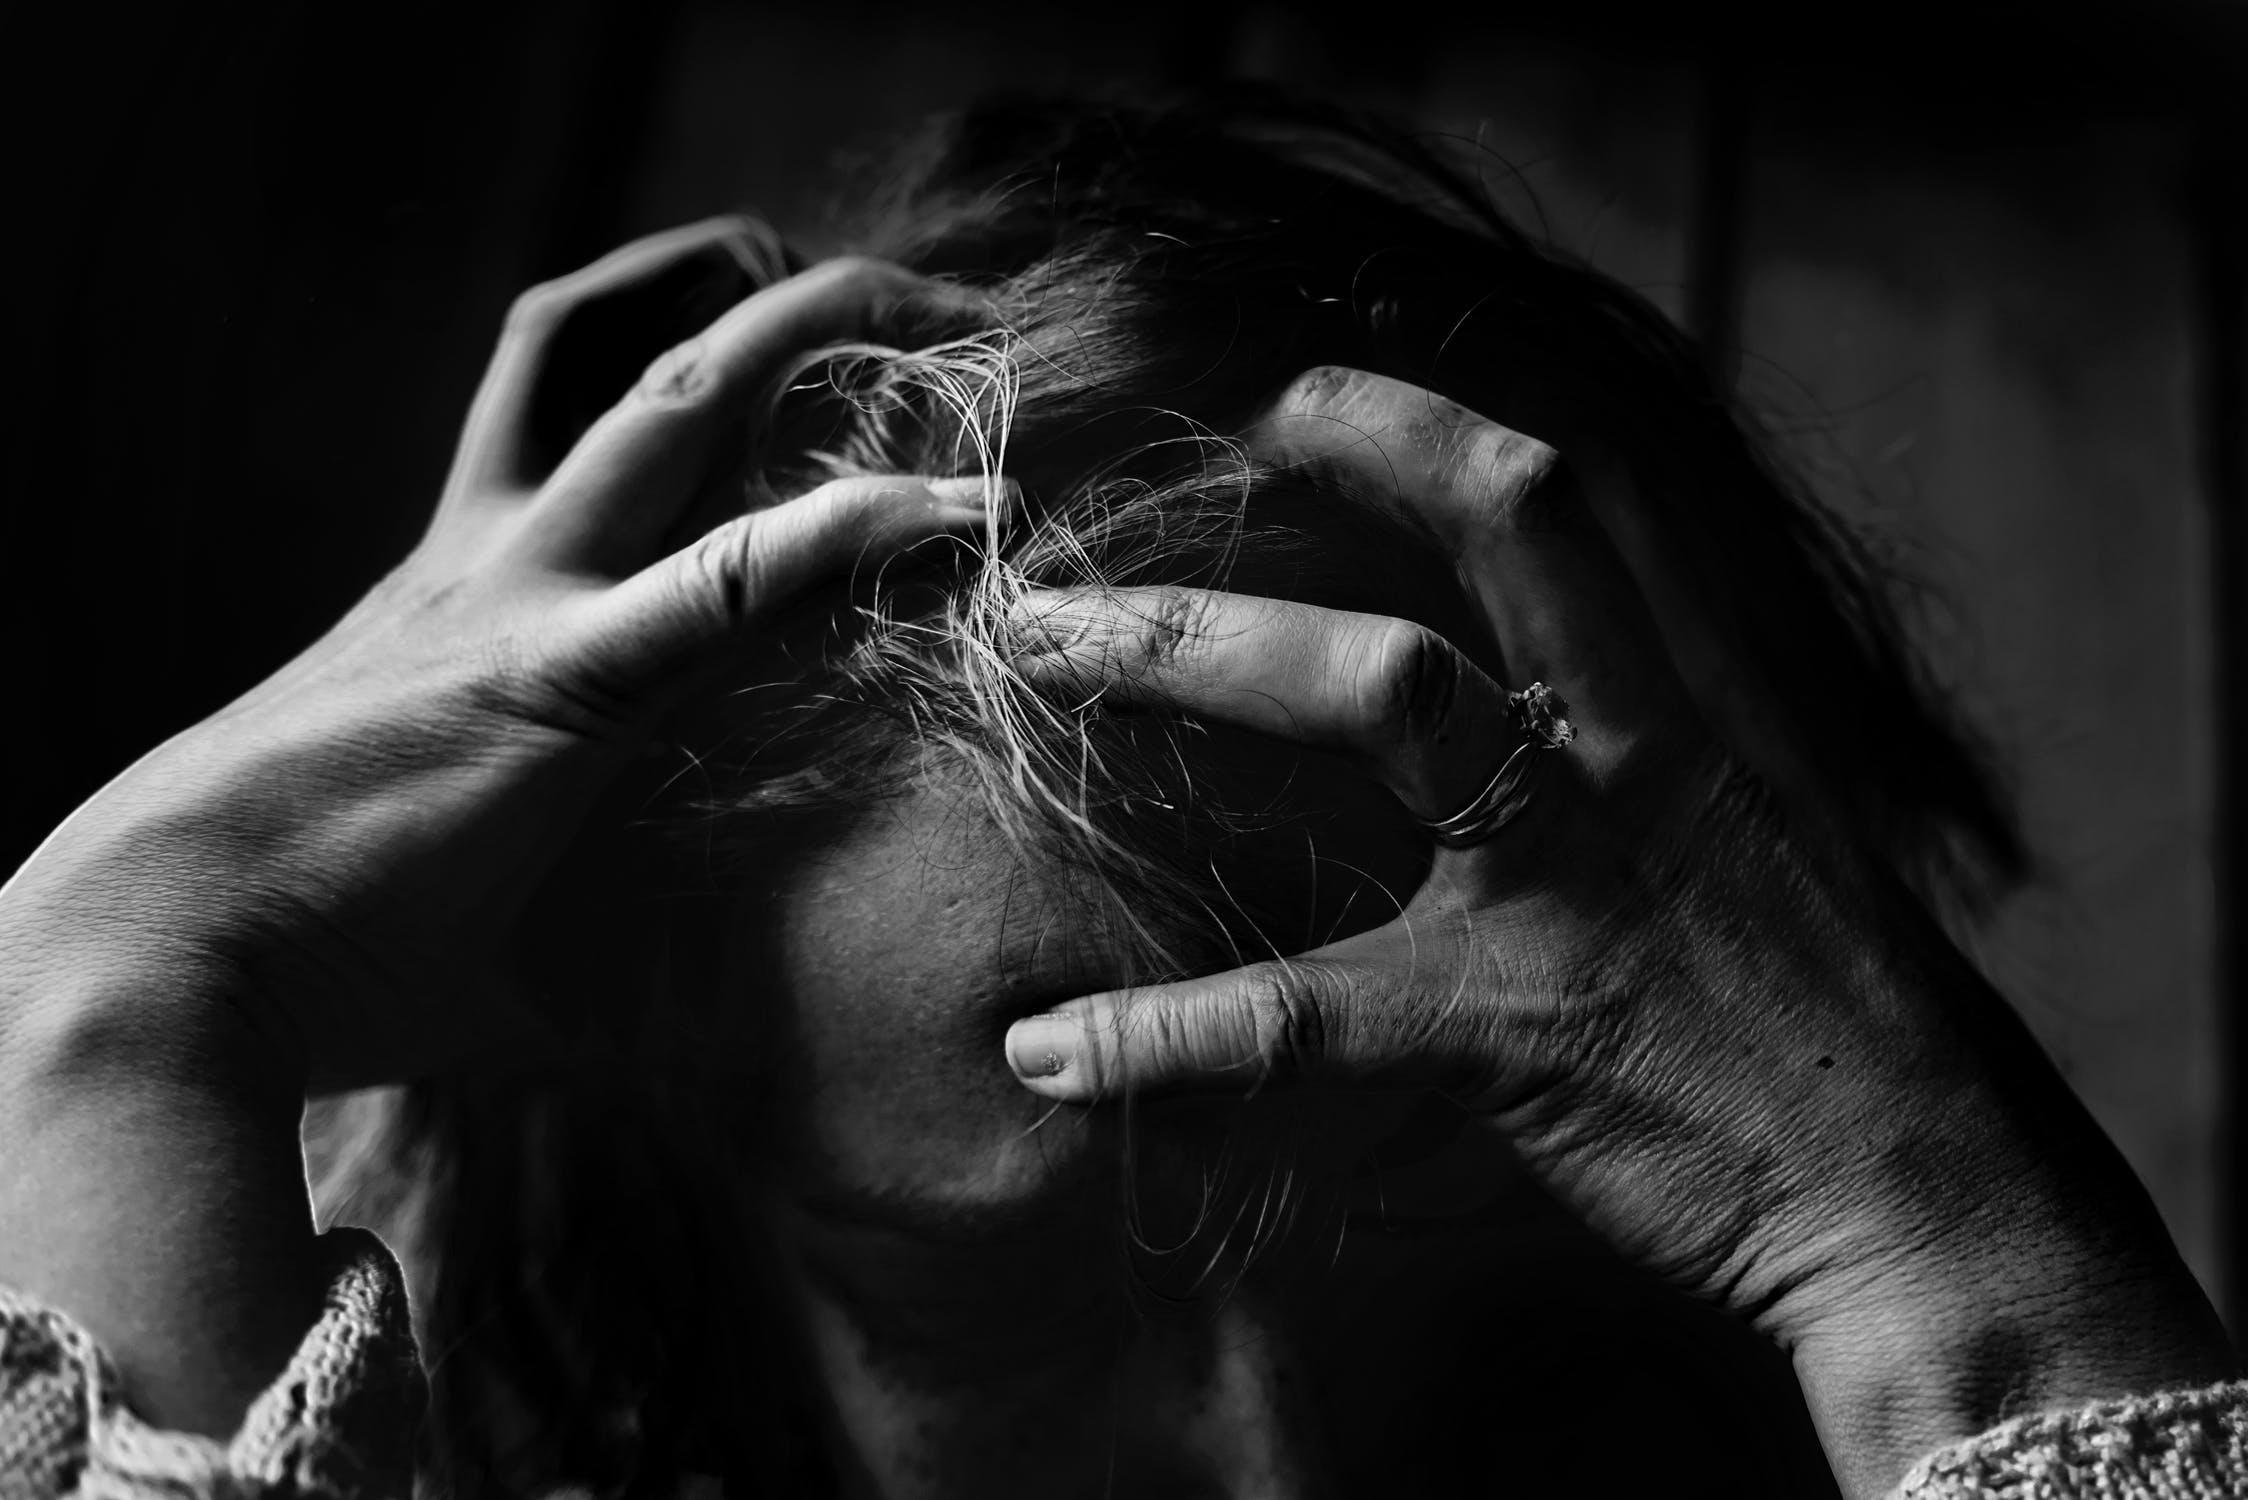 PTSD and addiction